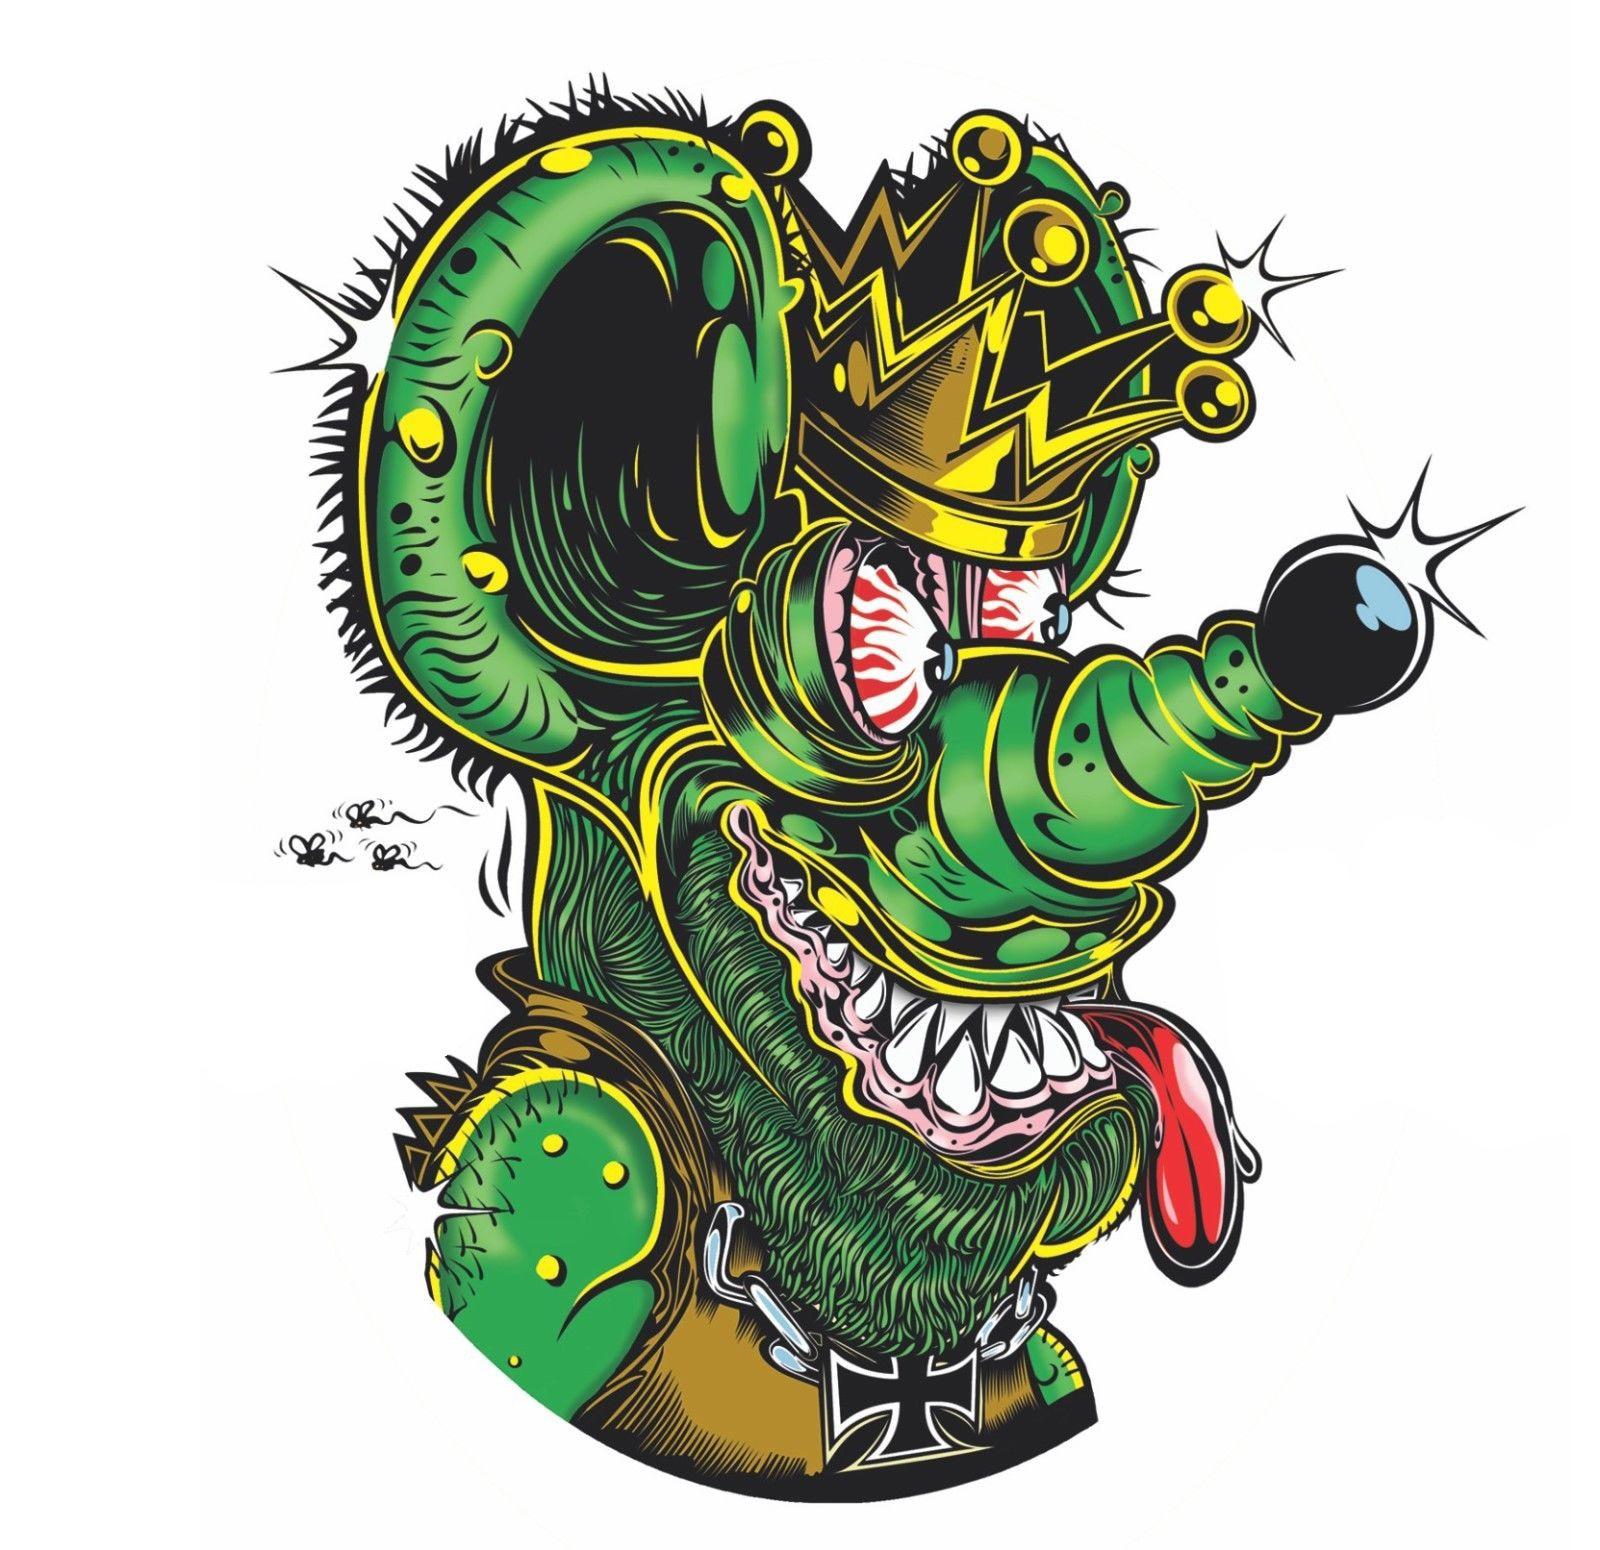 Rat Fink Head 10pcs Big Daddy Ed Roth Vinyl Decal Hot Rods Skateboard Stickers